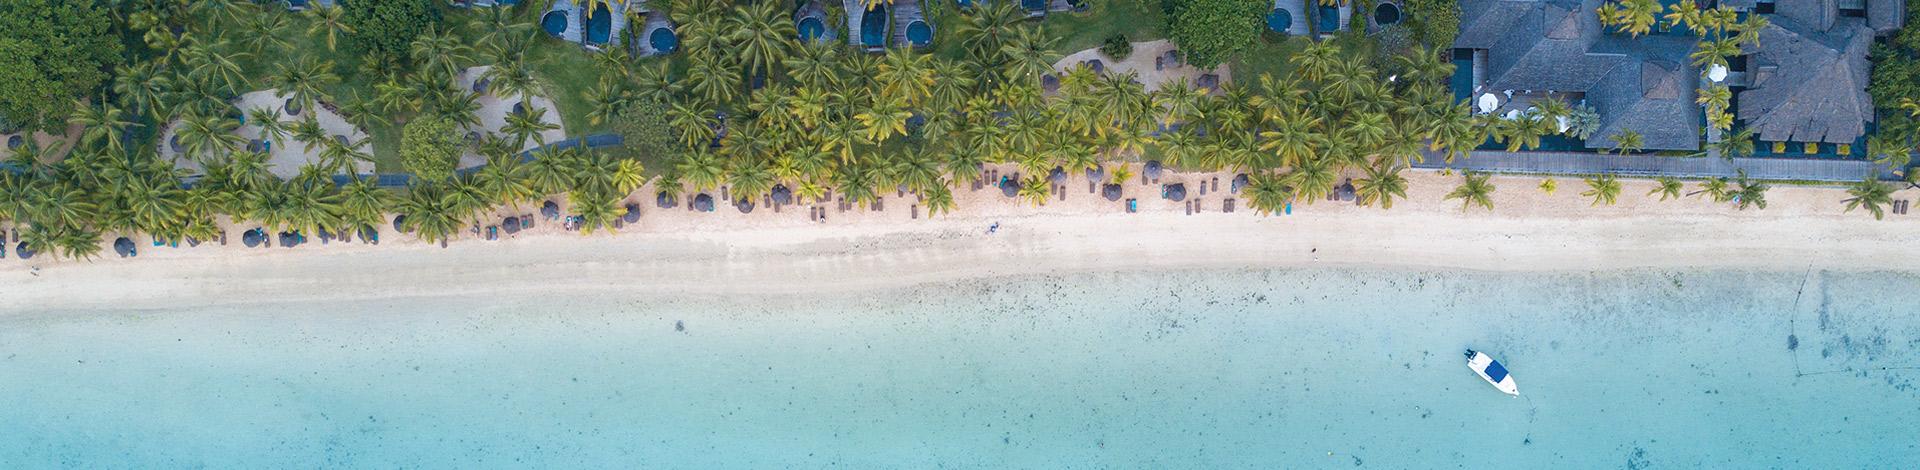 mauritius beachcomber resorts and hotels covid-19